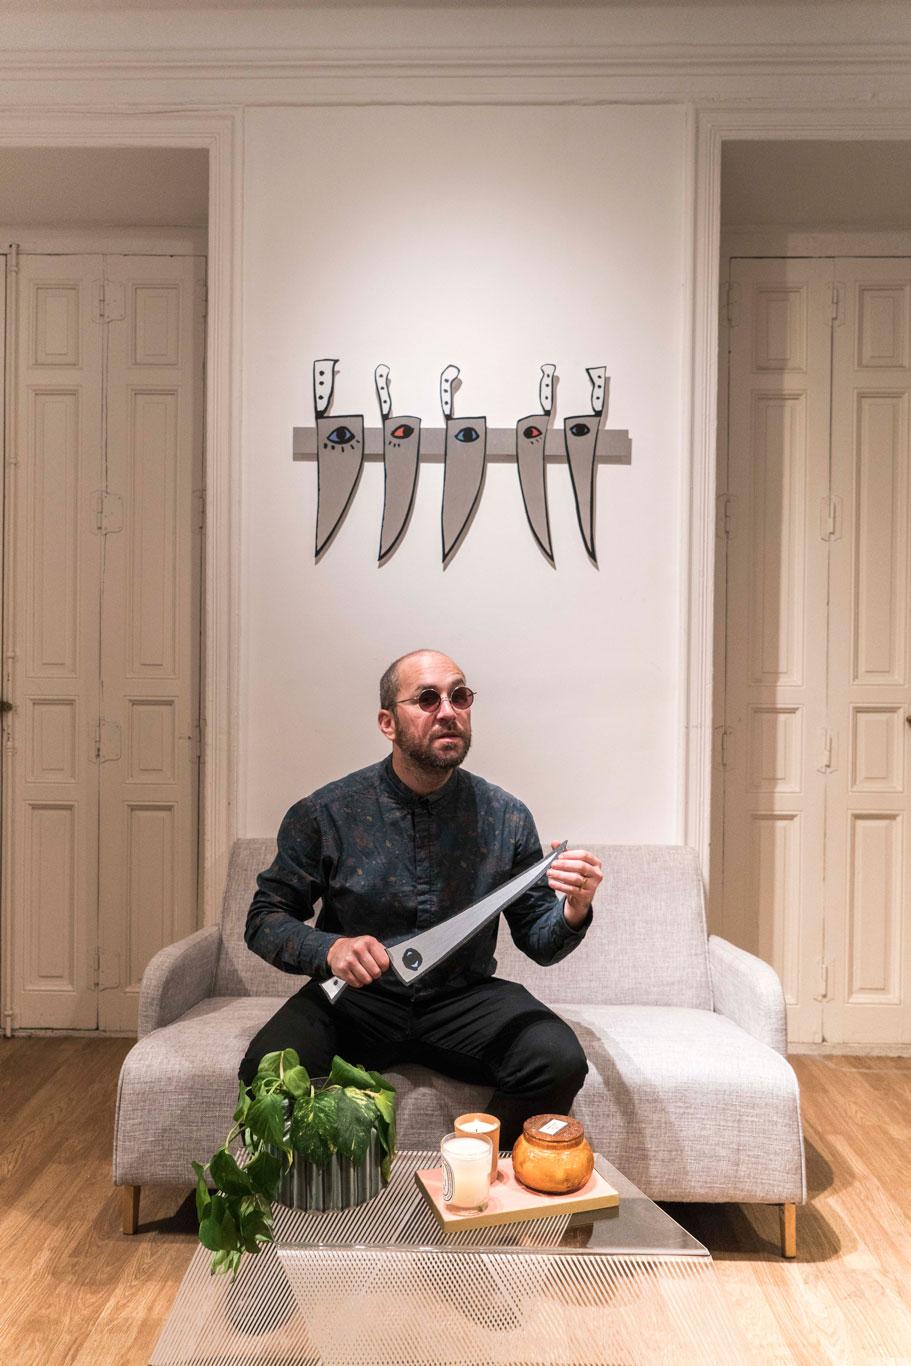 luigi-cuchillo-knife-bandeja-04.jpg